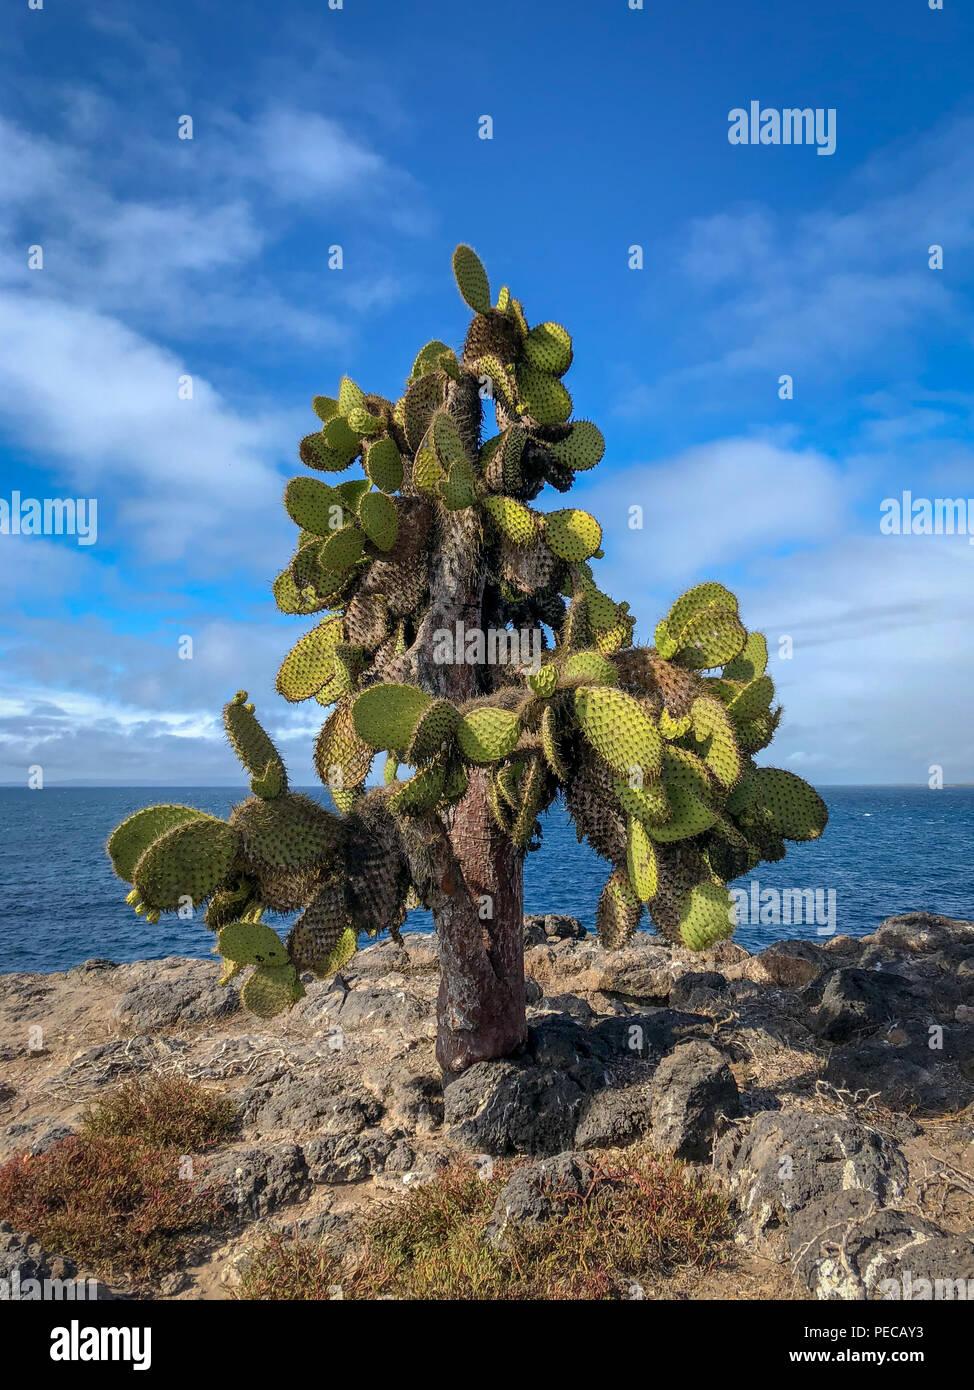 Cacti of Galápagos - Stock Image